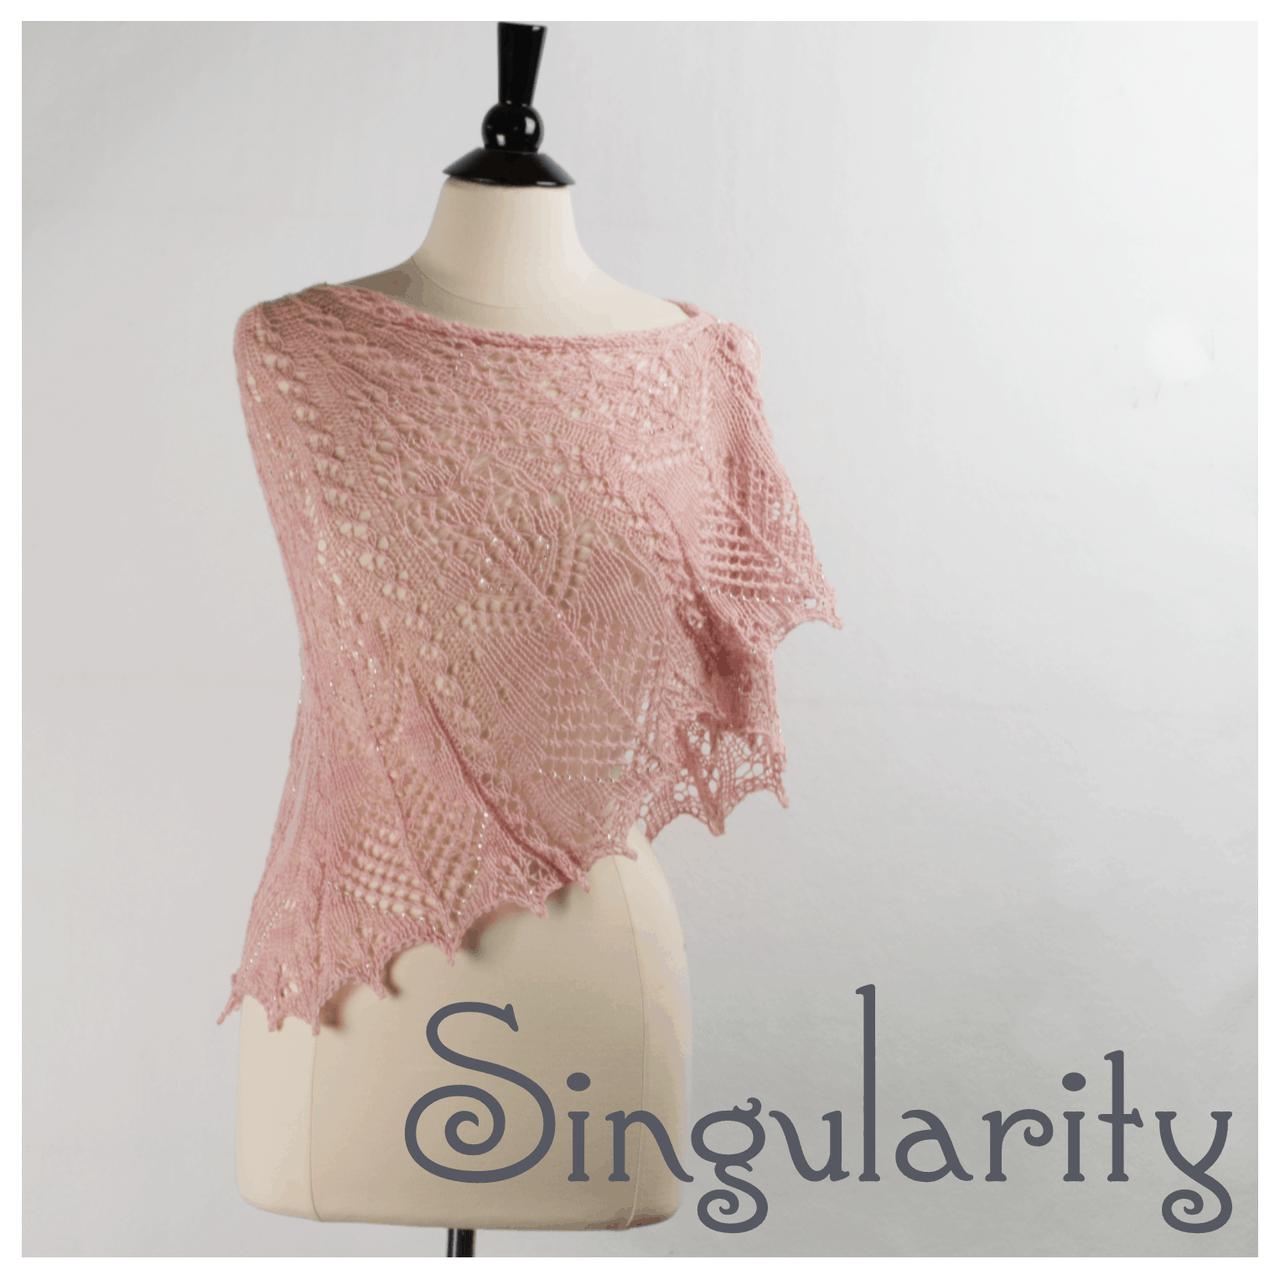 Singularity Shawl Kit